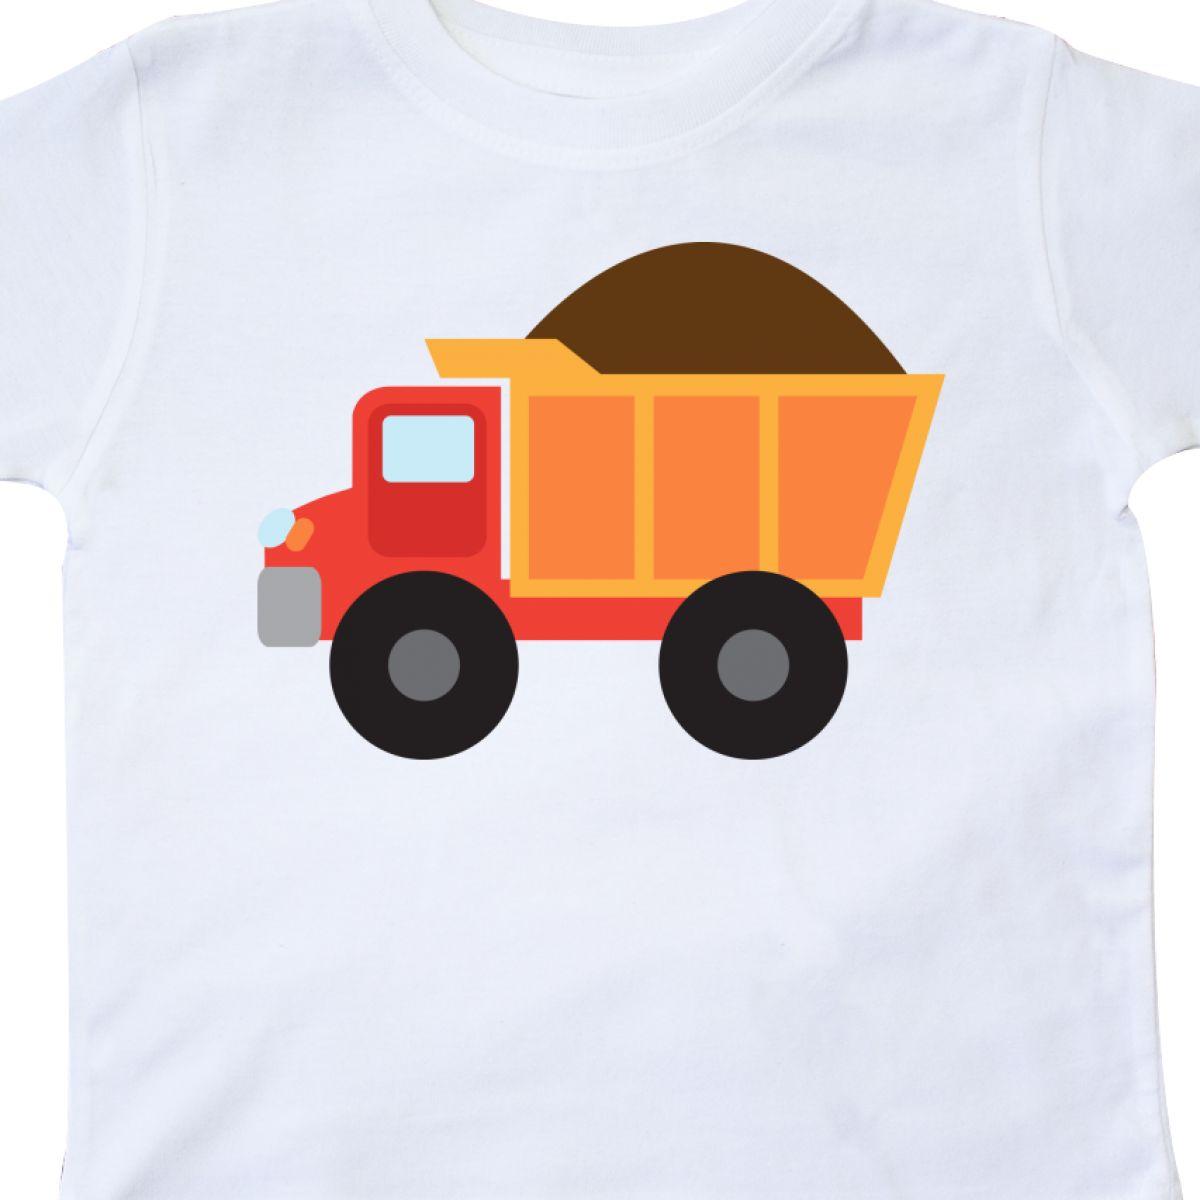 Inktastic-Work-Truck-Construction-Vehicle-Toddler-T-Shirt-Trucks-Vehicles-Cute thumbnail 38